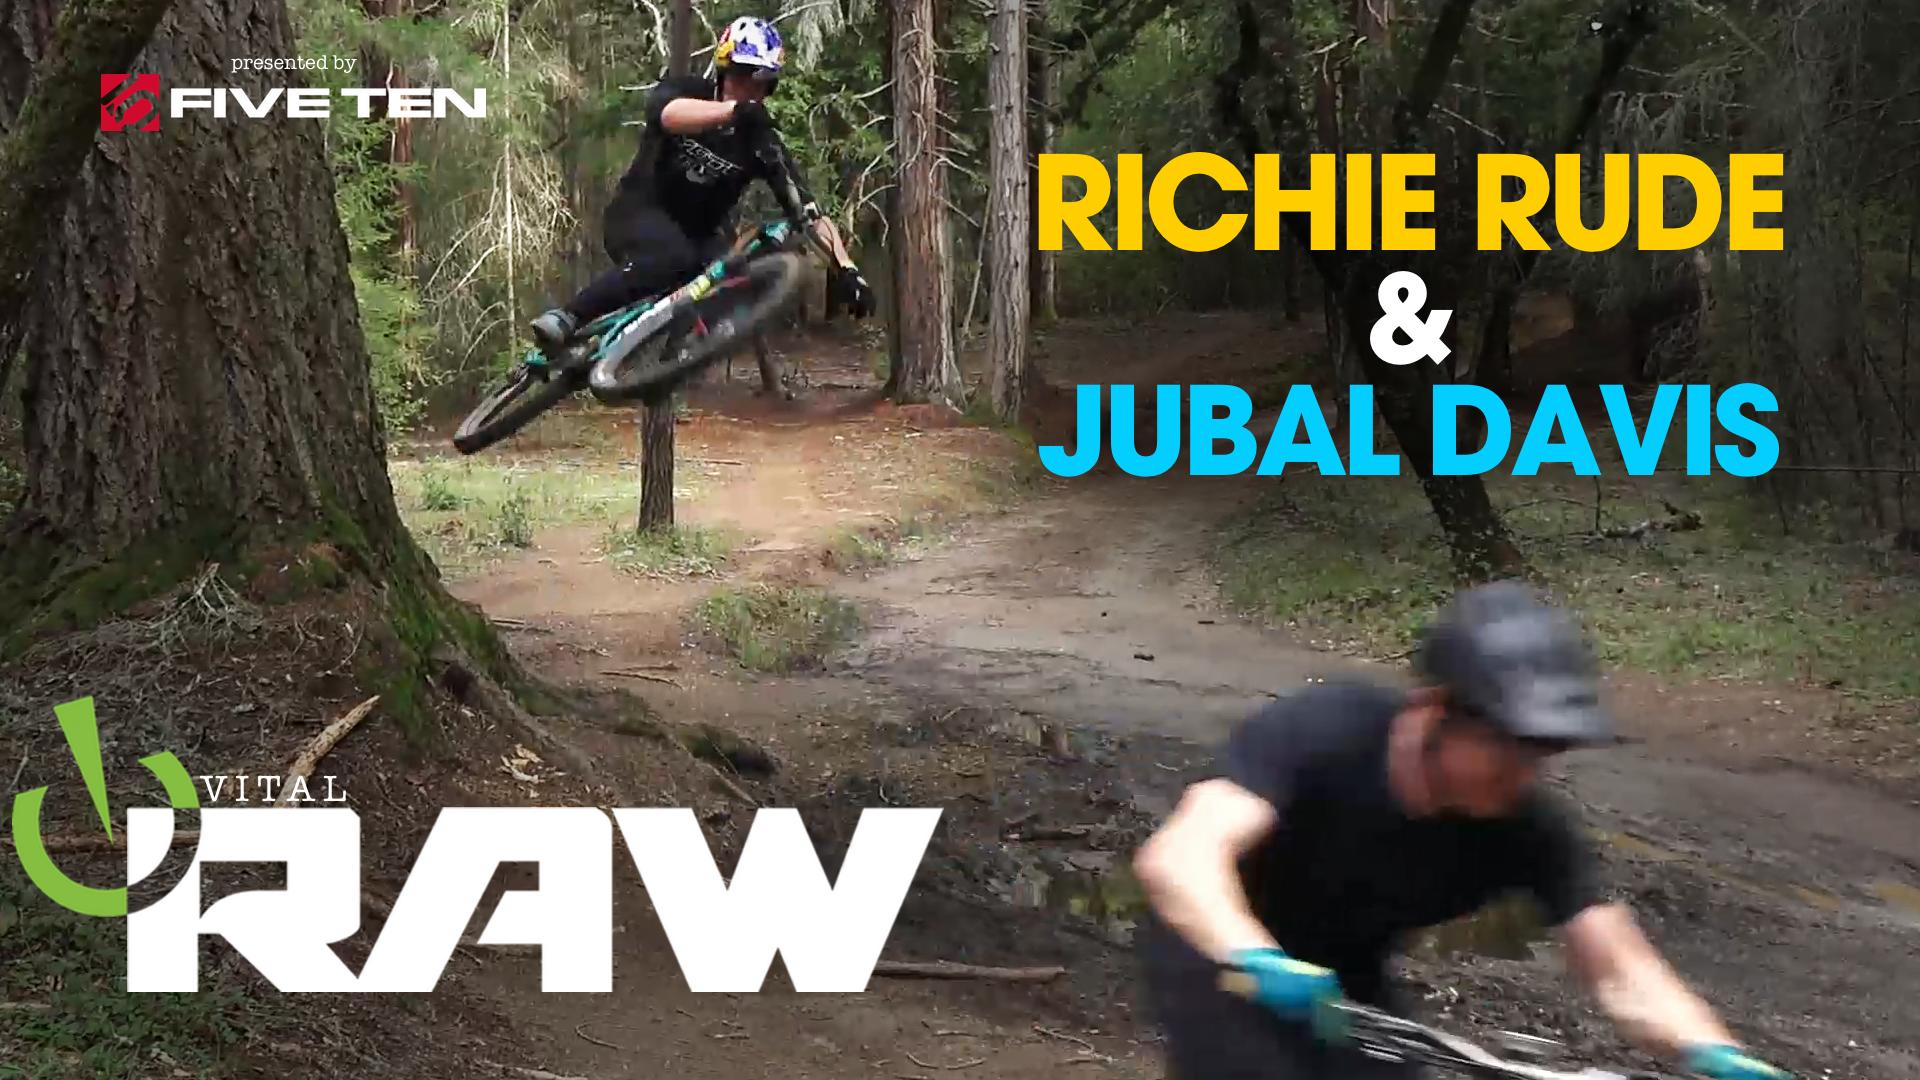 Vital RAW - Richie Rude and Jubal Davis